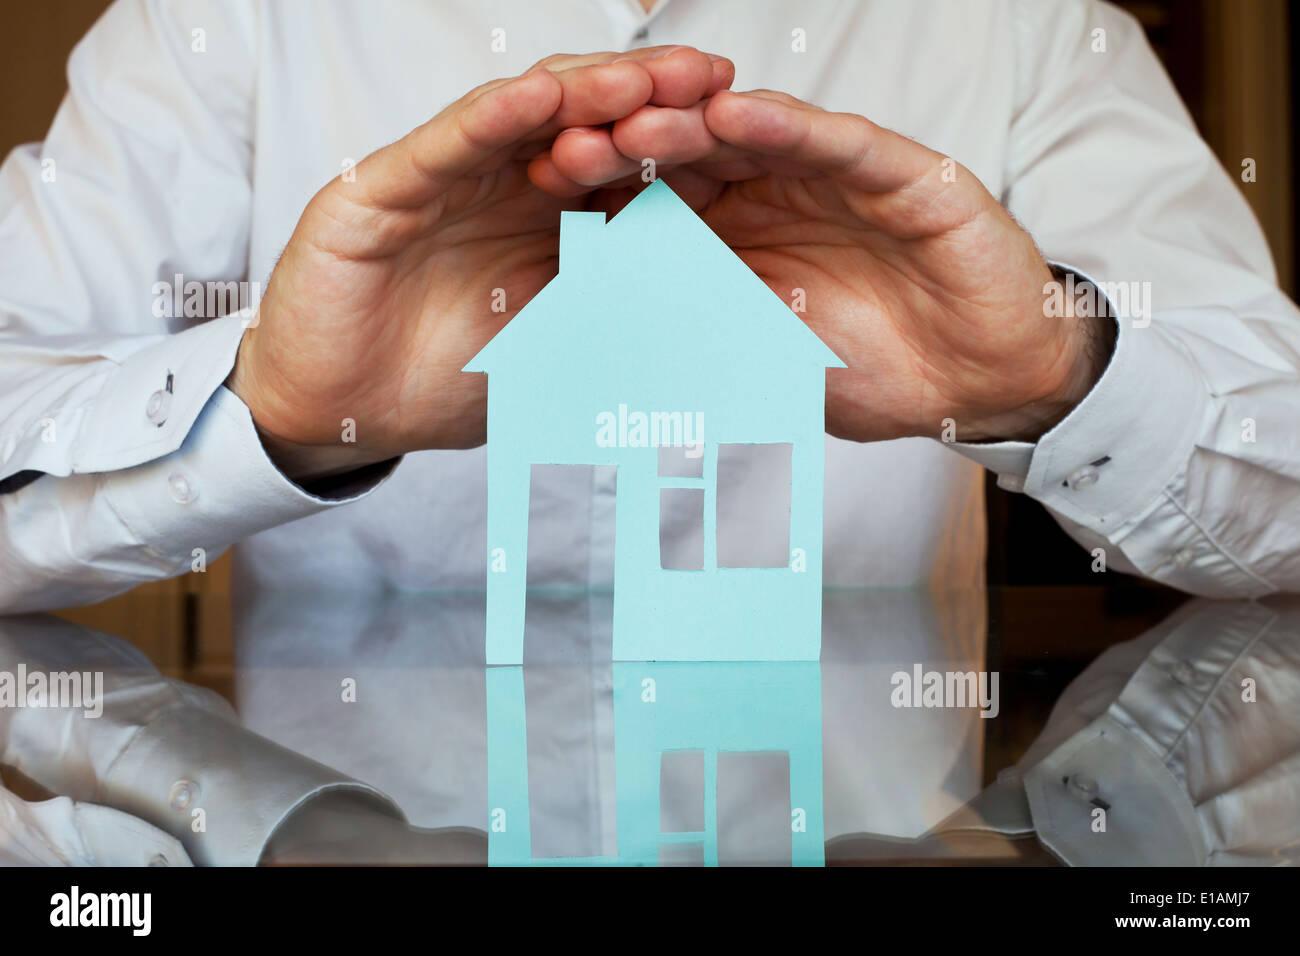 Immobilien-Versicherungen-Konzept Stockbild